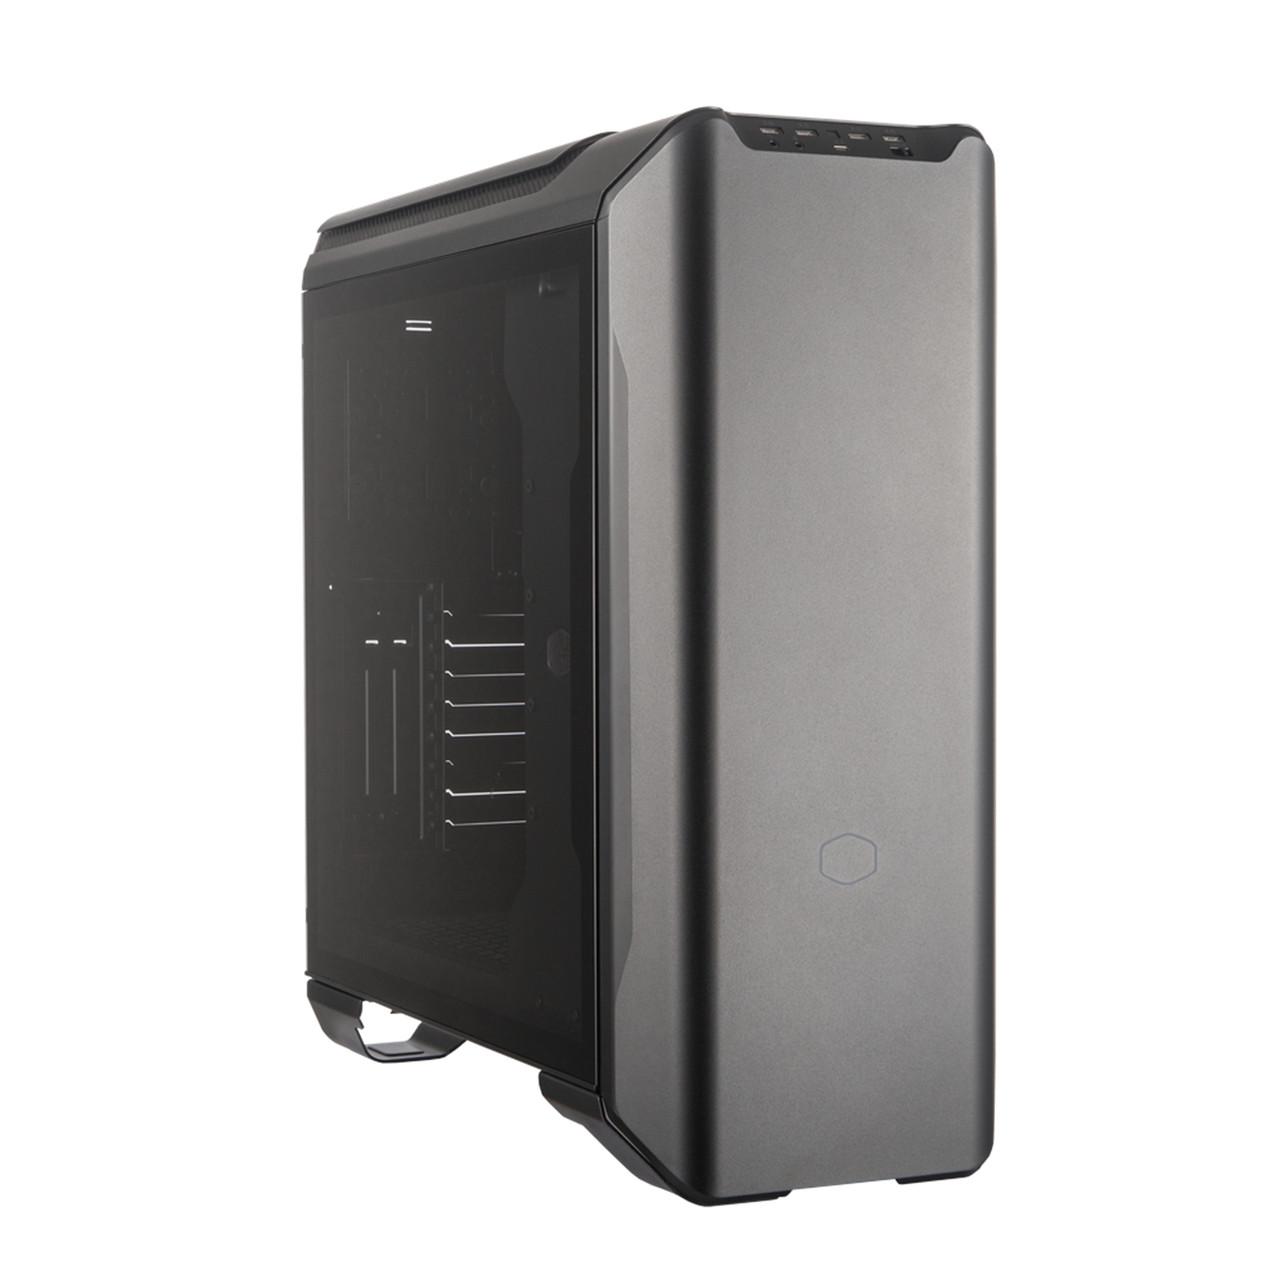 Корпус Cooler Master MasterCase SL600M Black Edition,без БП, Tempered Glass,2xUSB3.0,1xUSB-C,черный